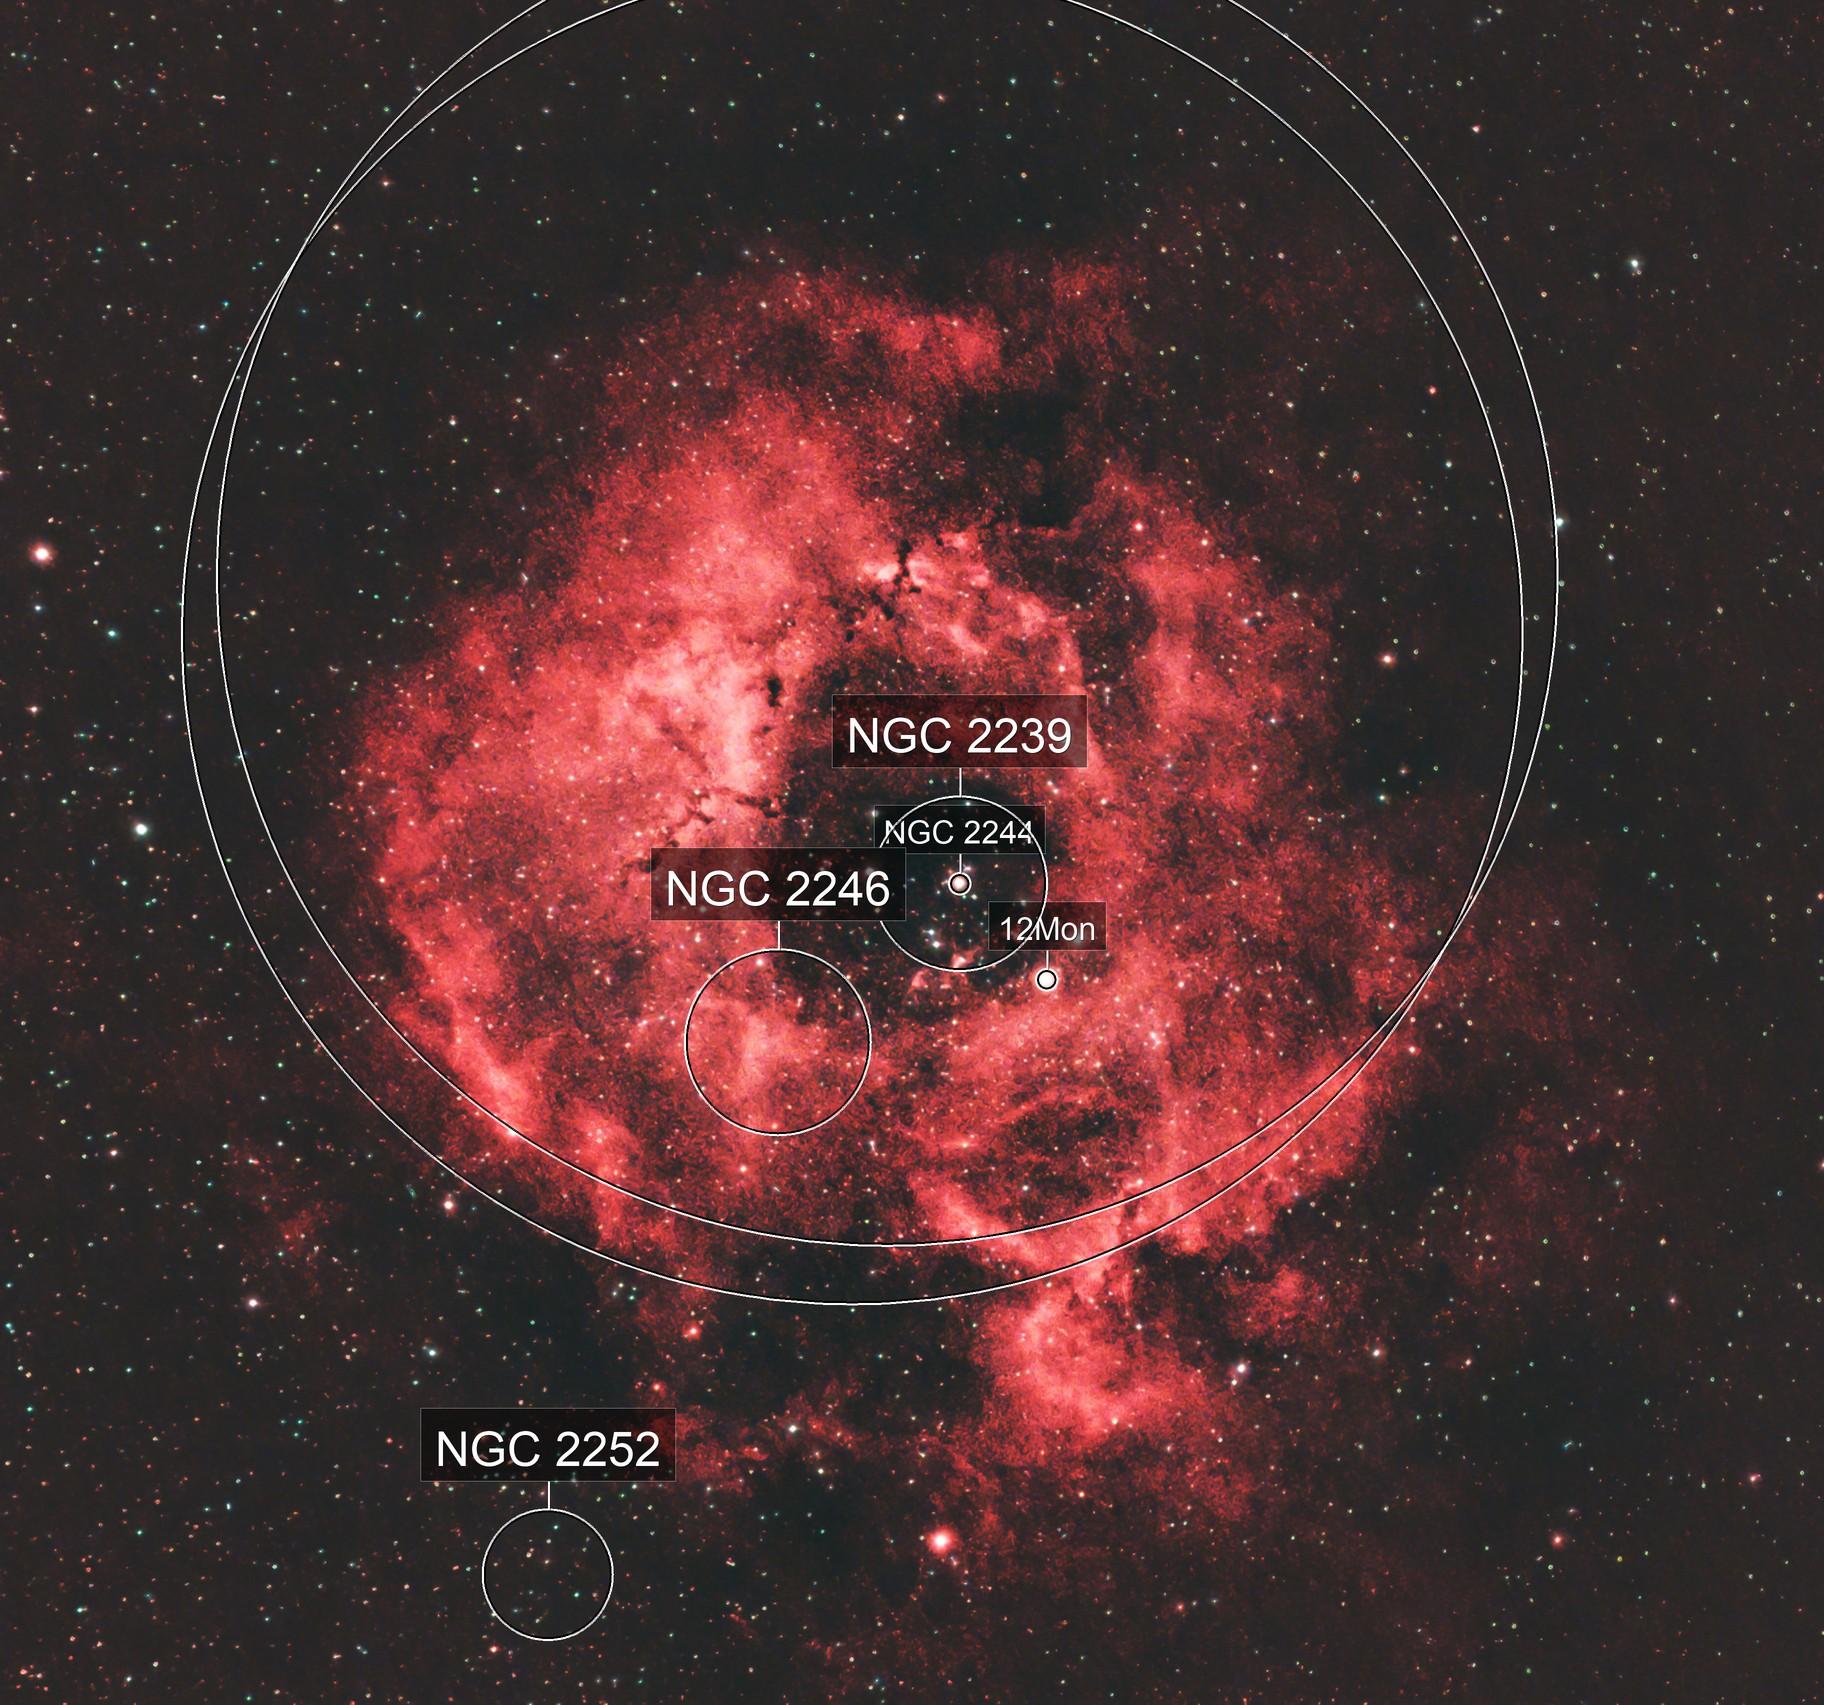 Rosette Nebula - through the clouds